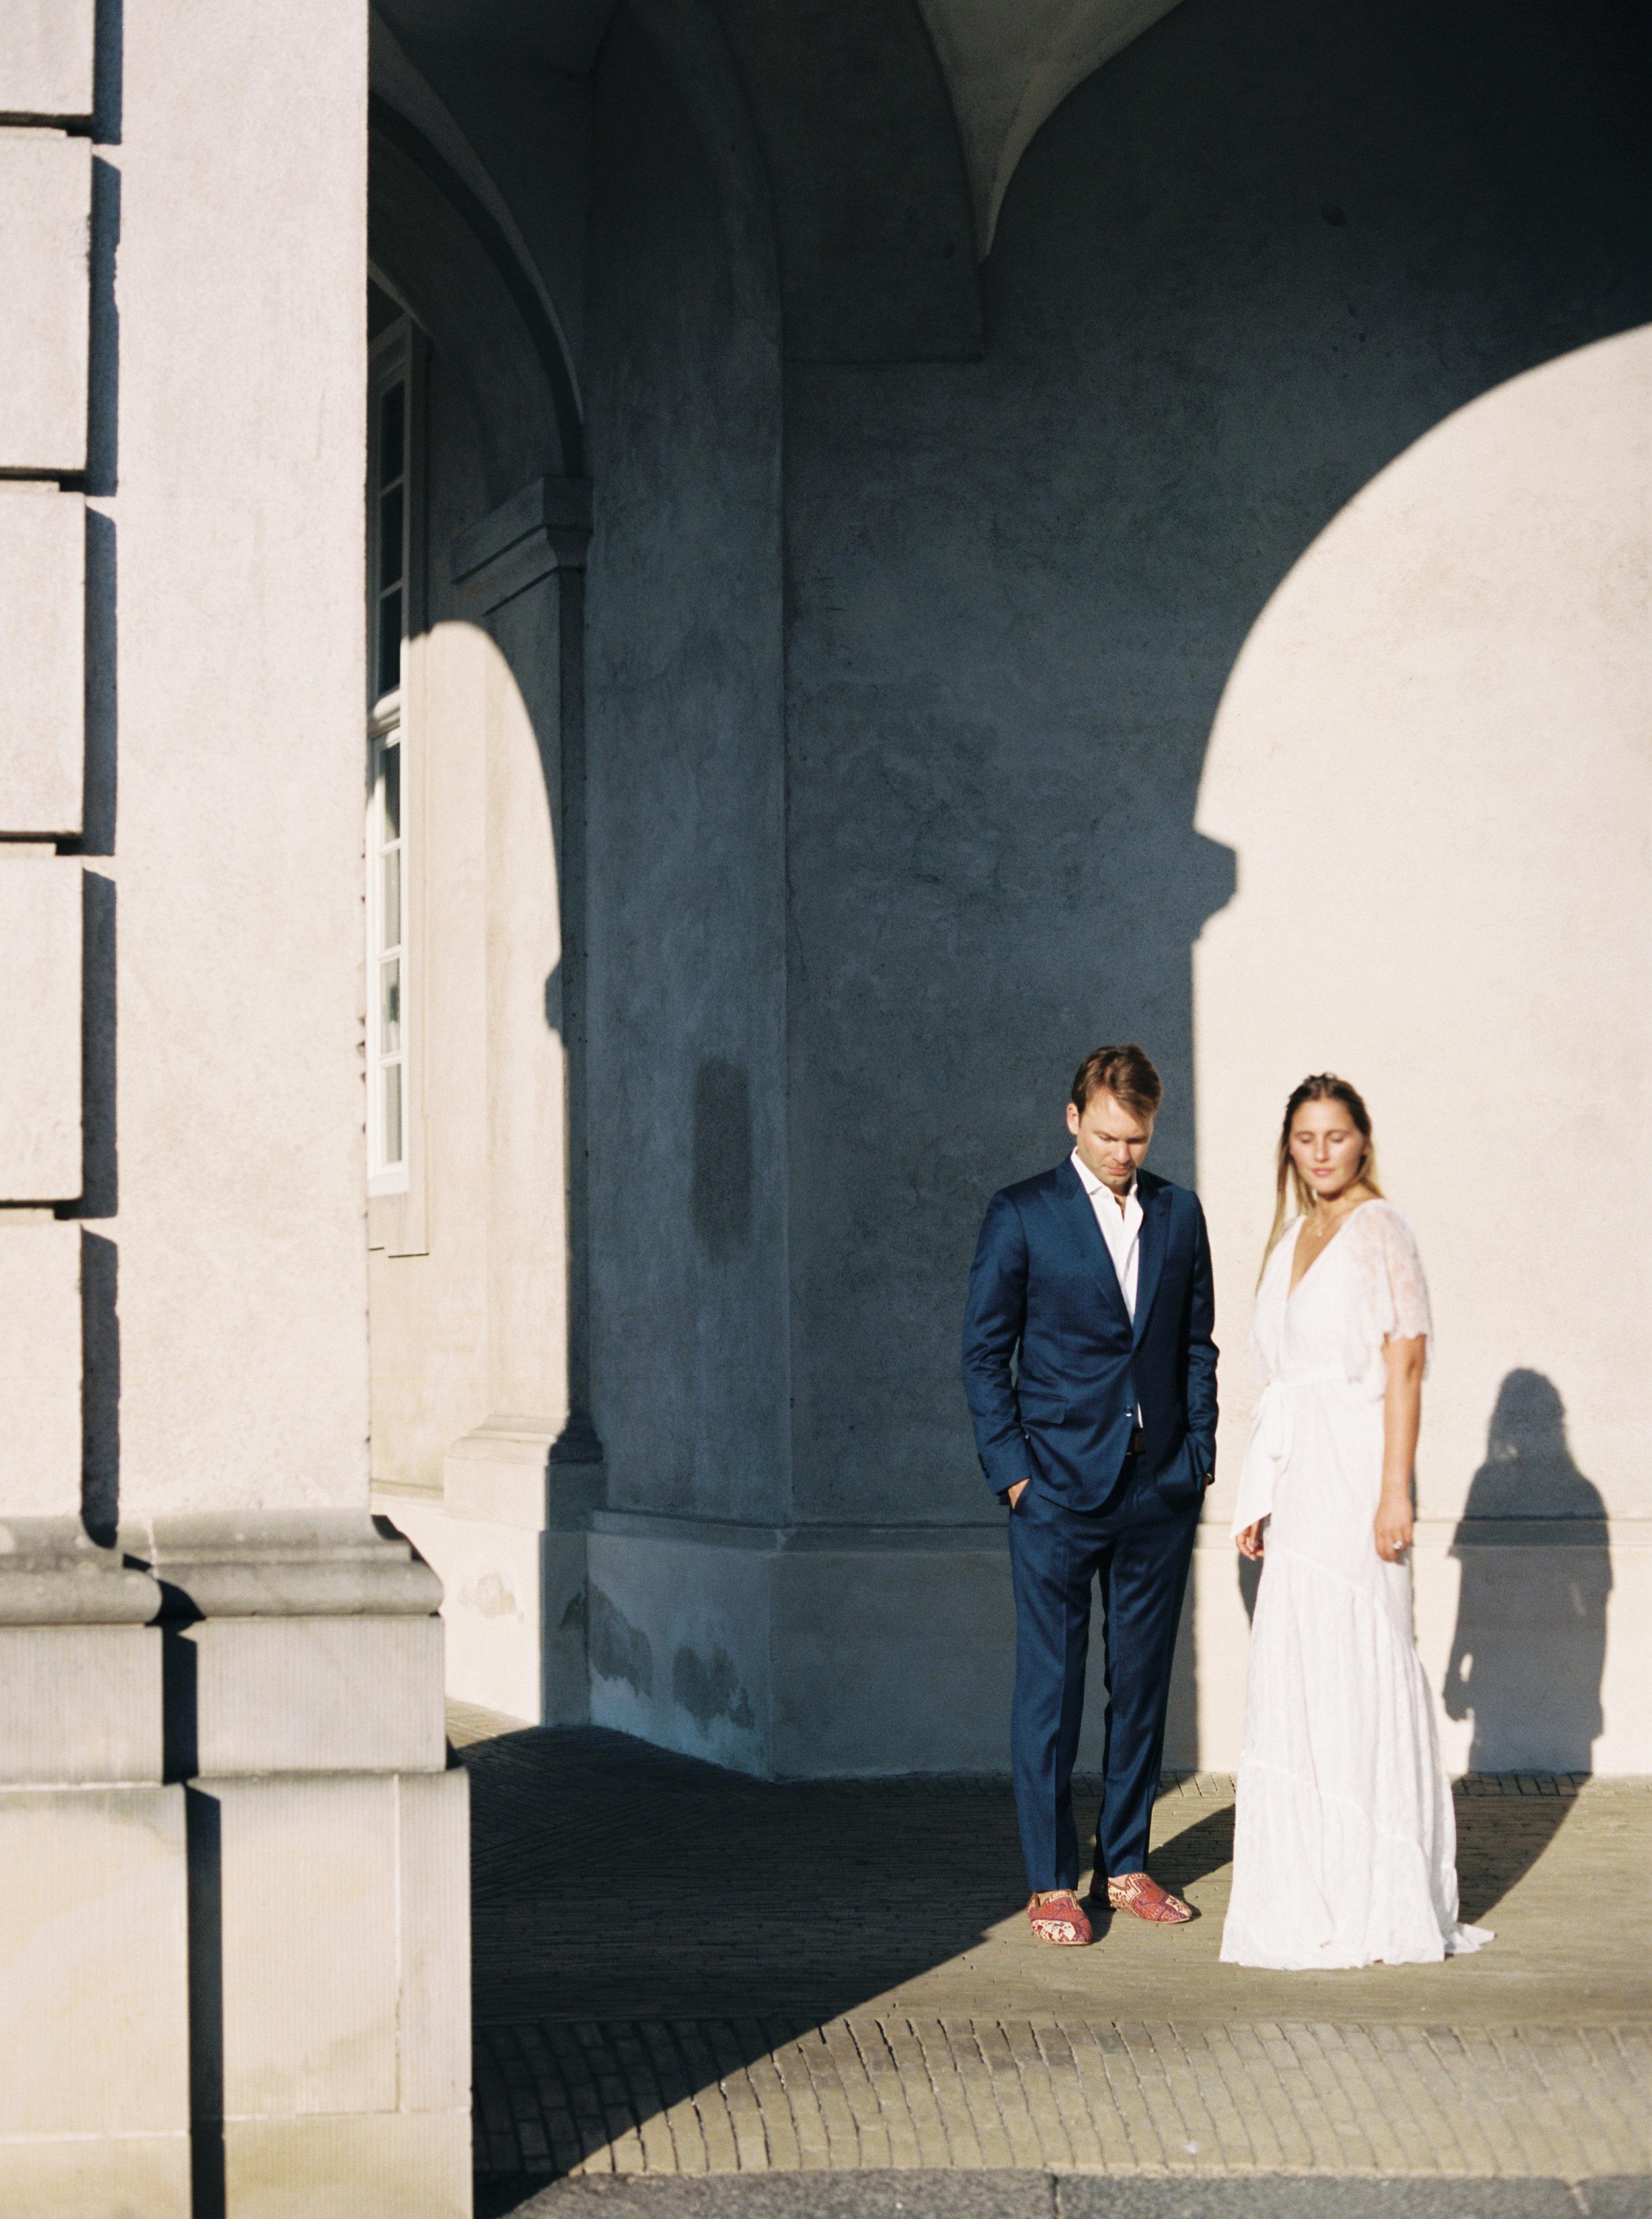 Kyle John l Fine Art Wedding Photography l Chicago, Copenhagen, California, New York, Destination l Blog l Alexis and Zach_Copenhagen Part 2_21